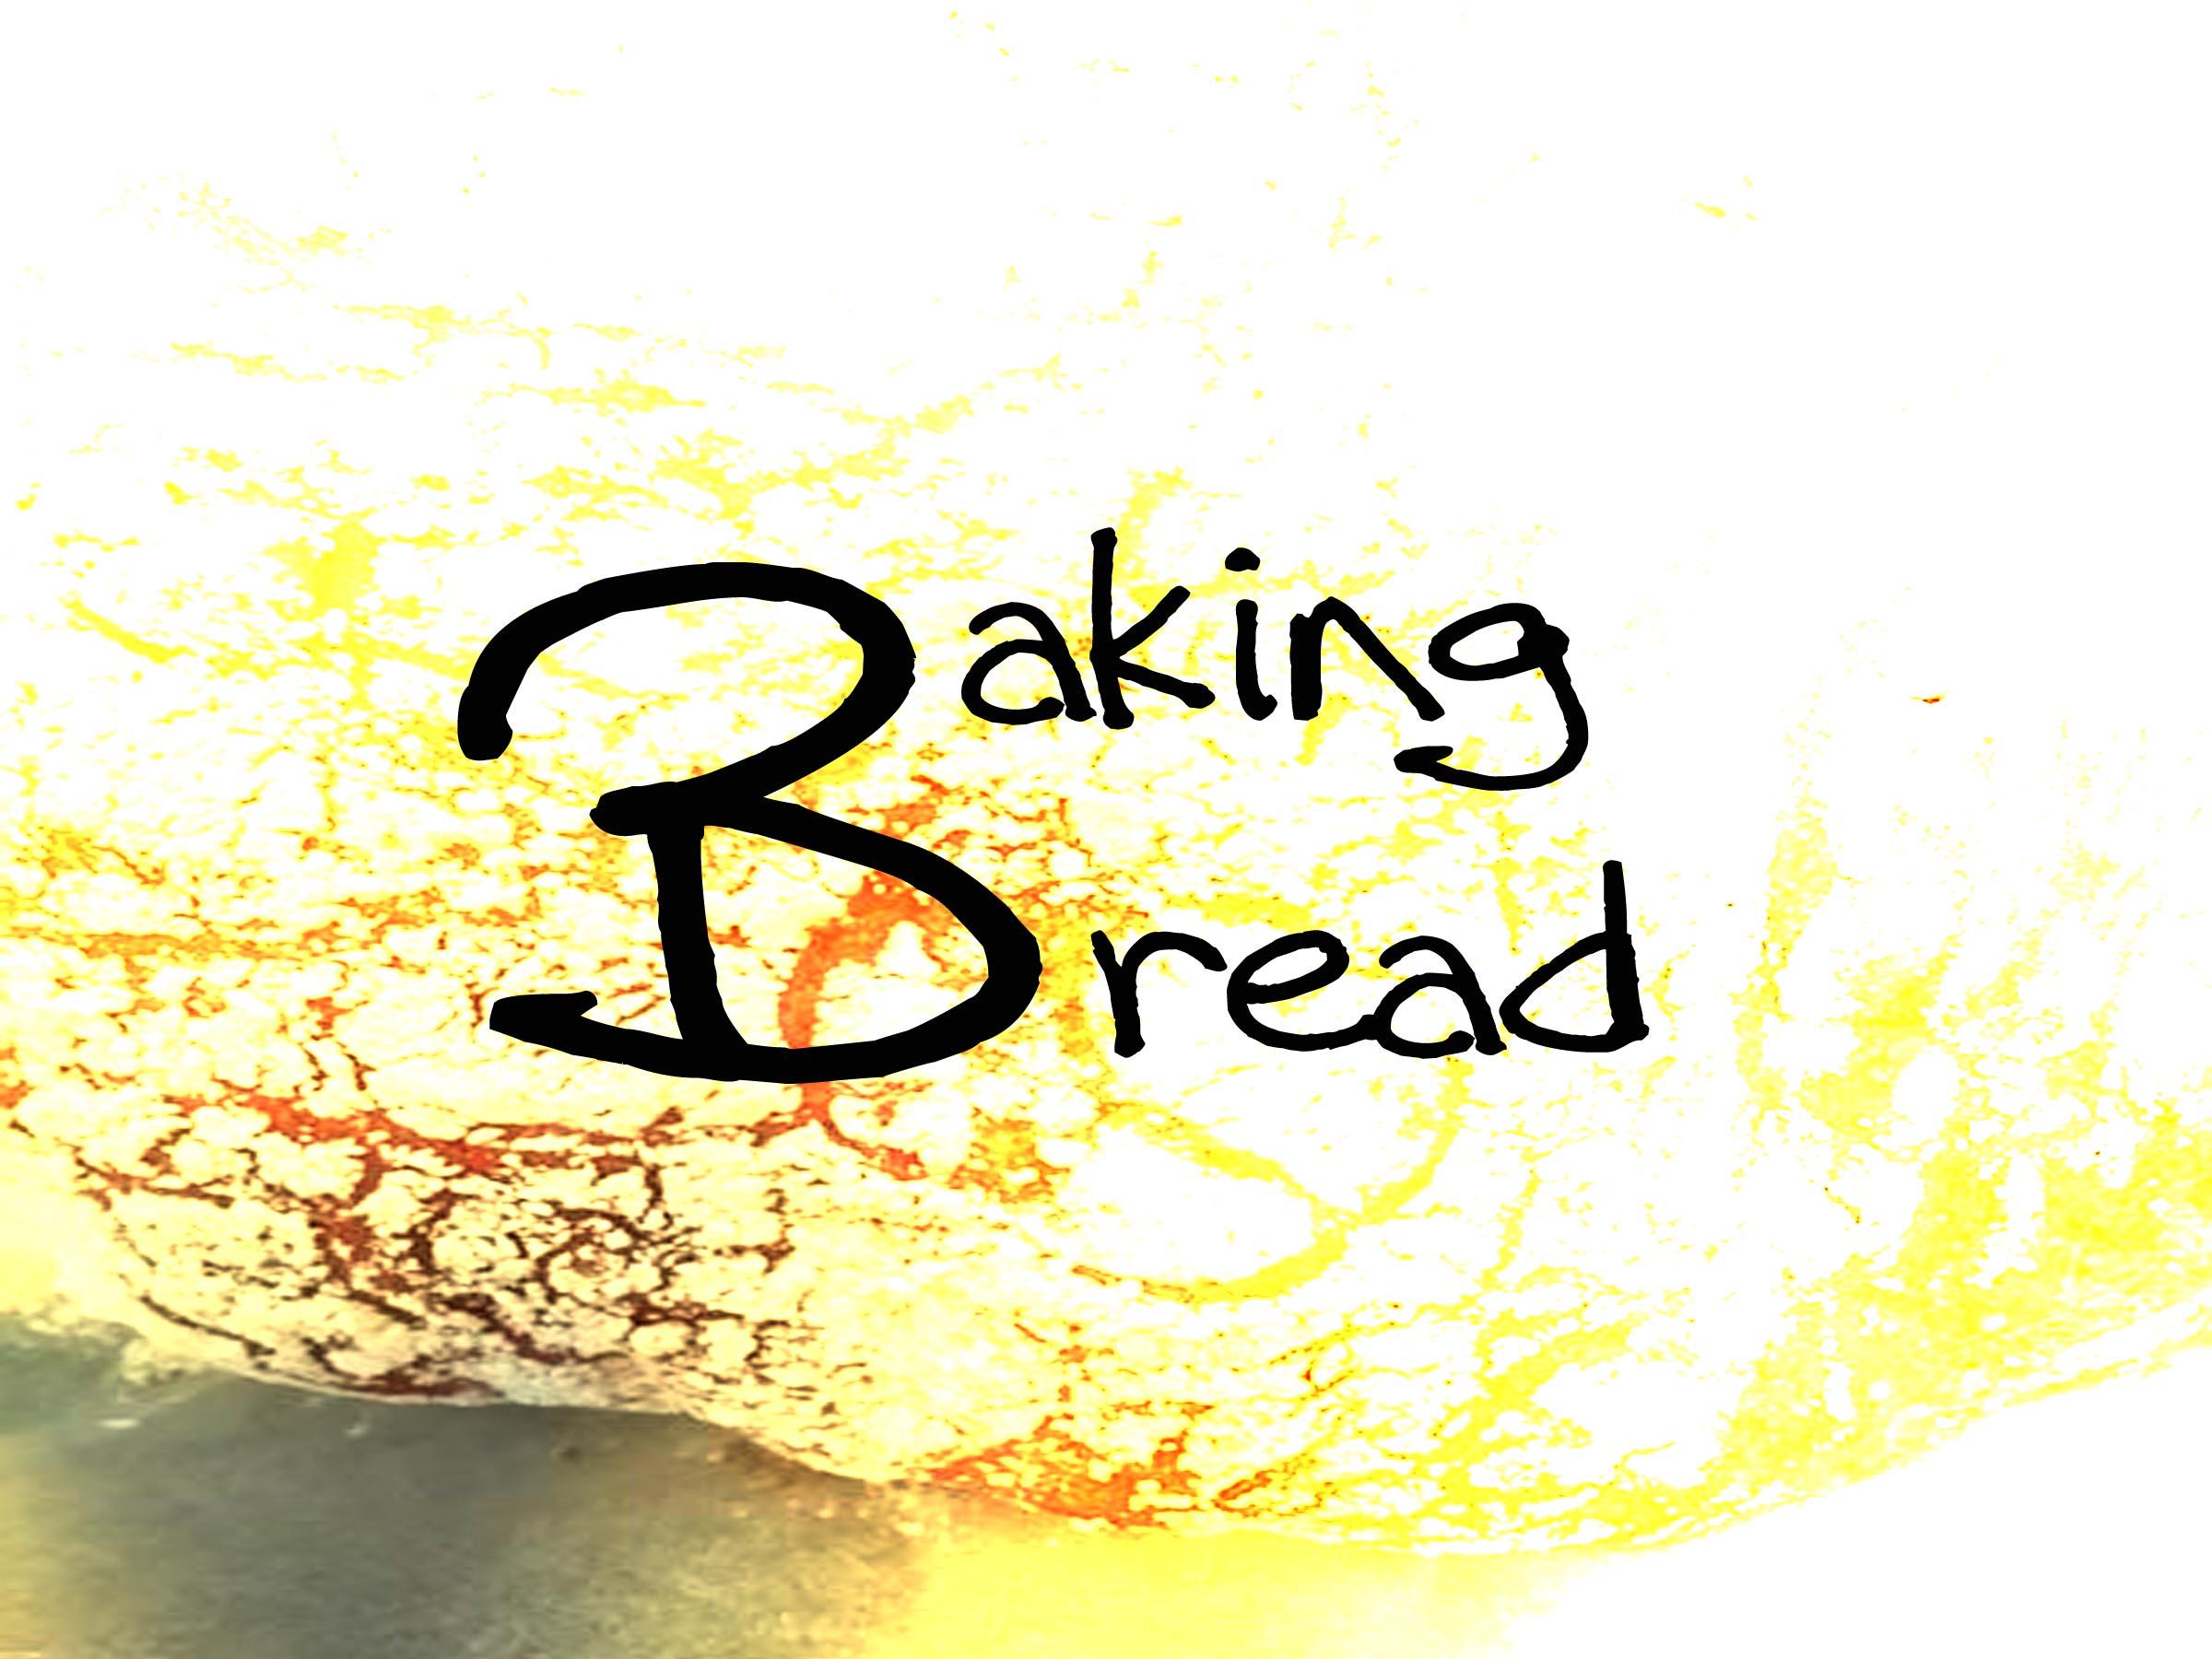 Bakin' Bread